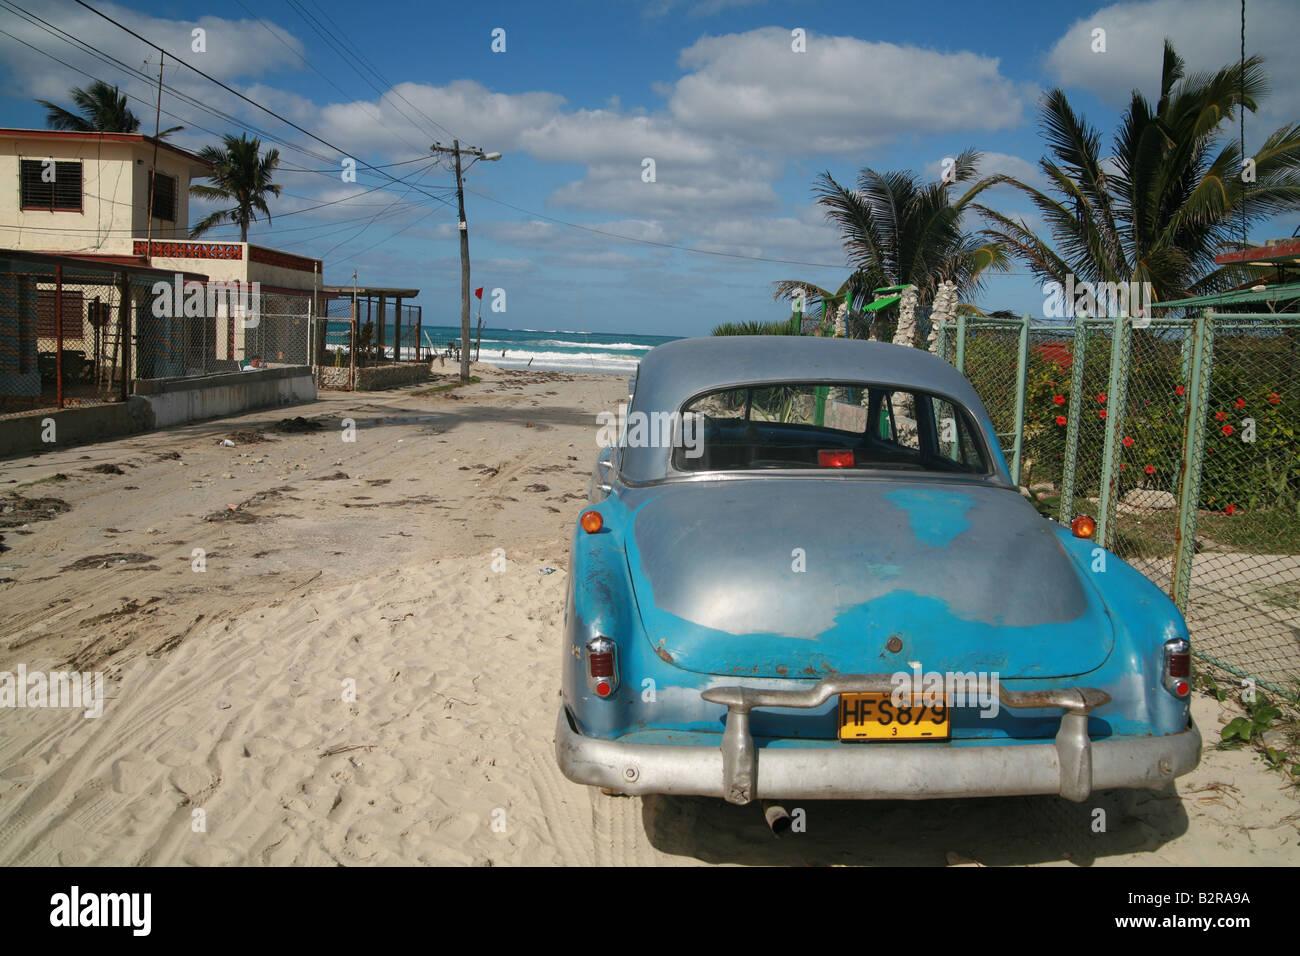 Oldtimer geparkt vor der Provinz Playas del Este Beach Havanna Kuba Lateinamerika Stockbild